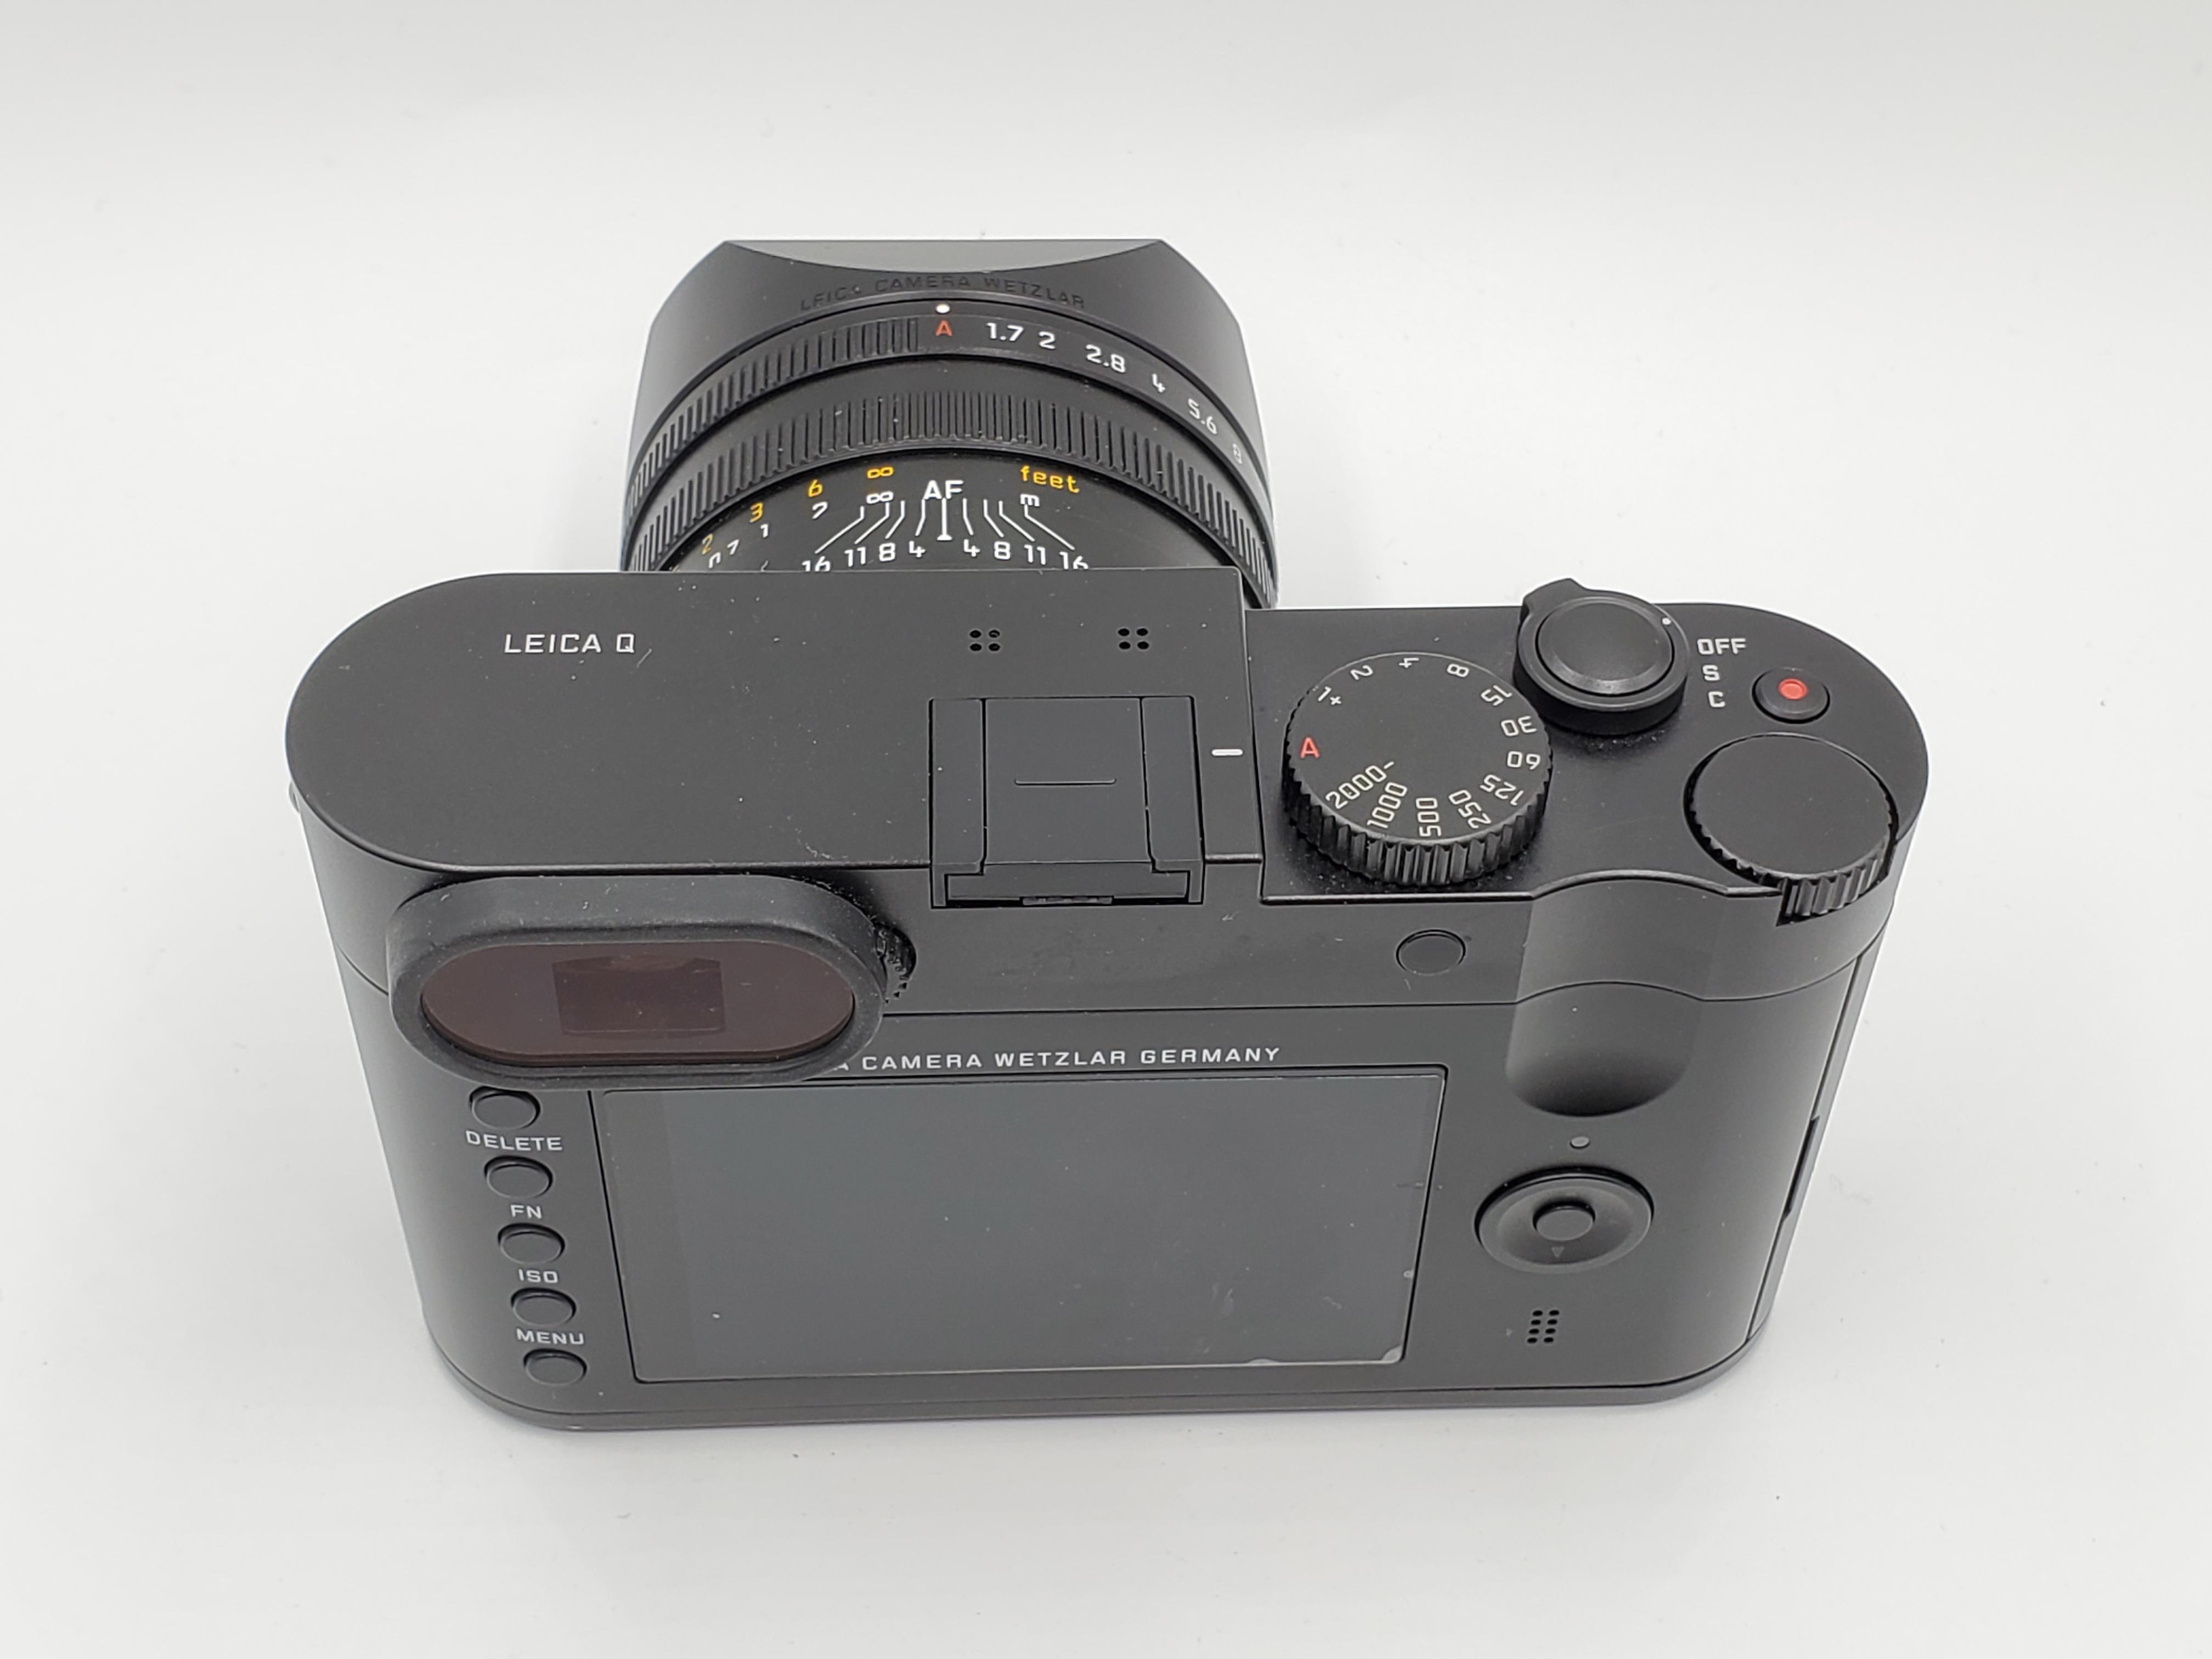 USED Leica Q (Type 116) Digital Camera